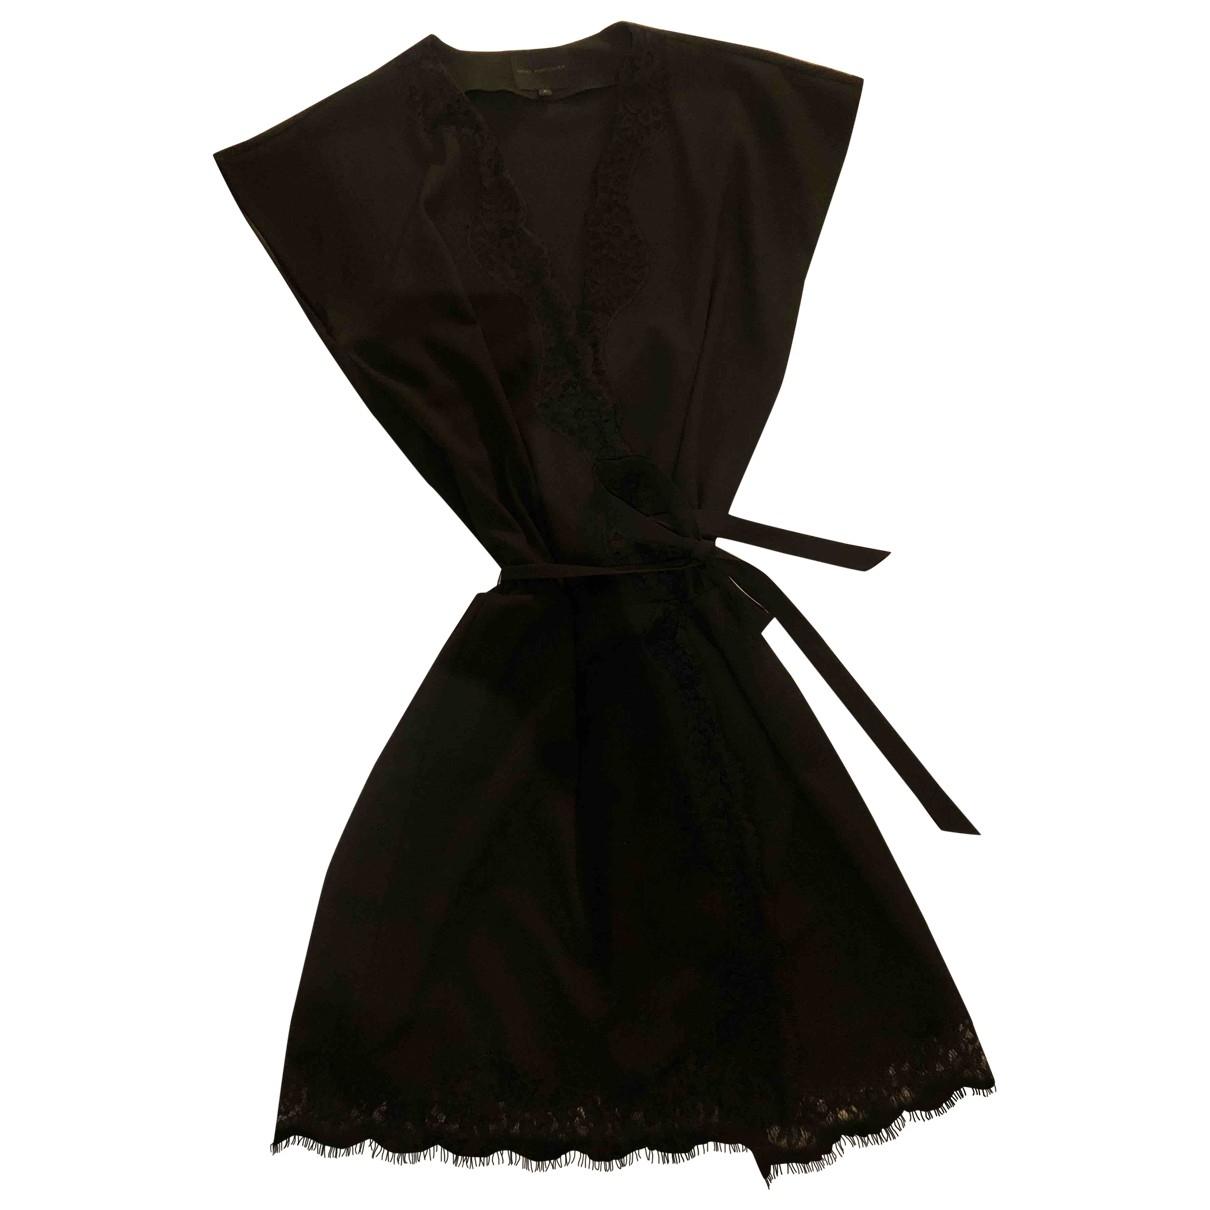 Hôtel Particulier \N Black dress for Women S International